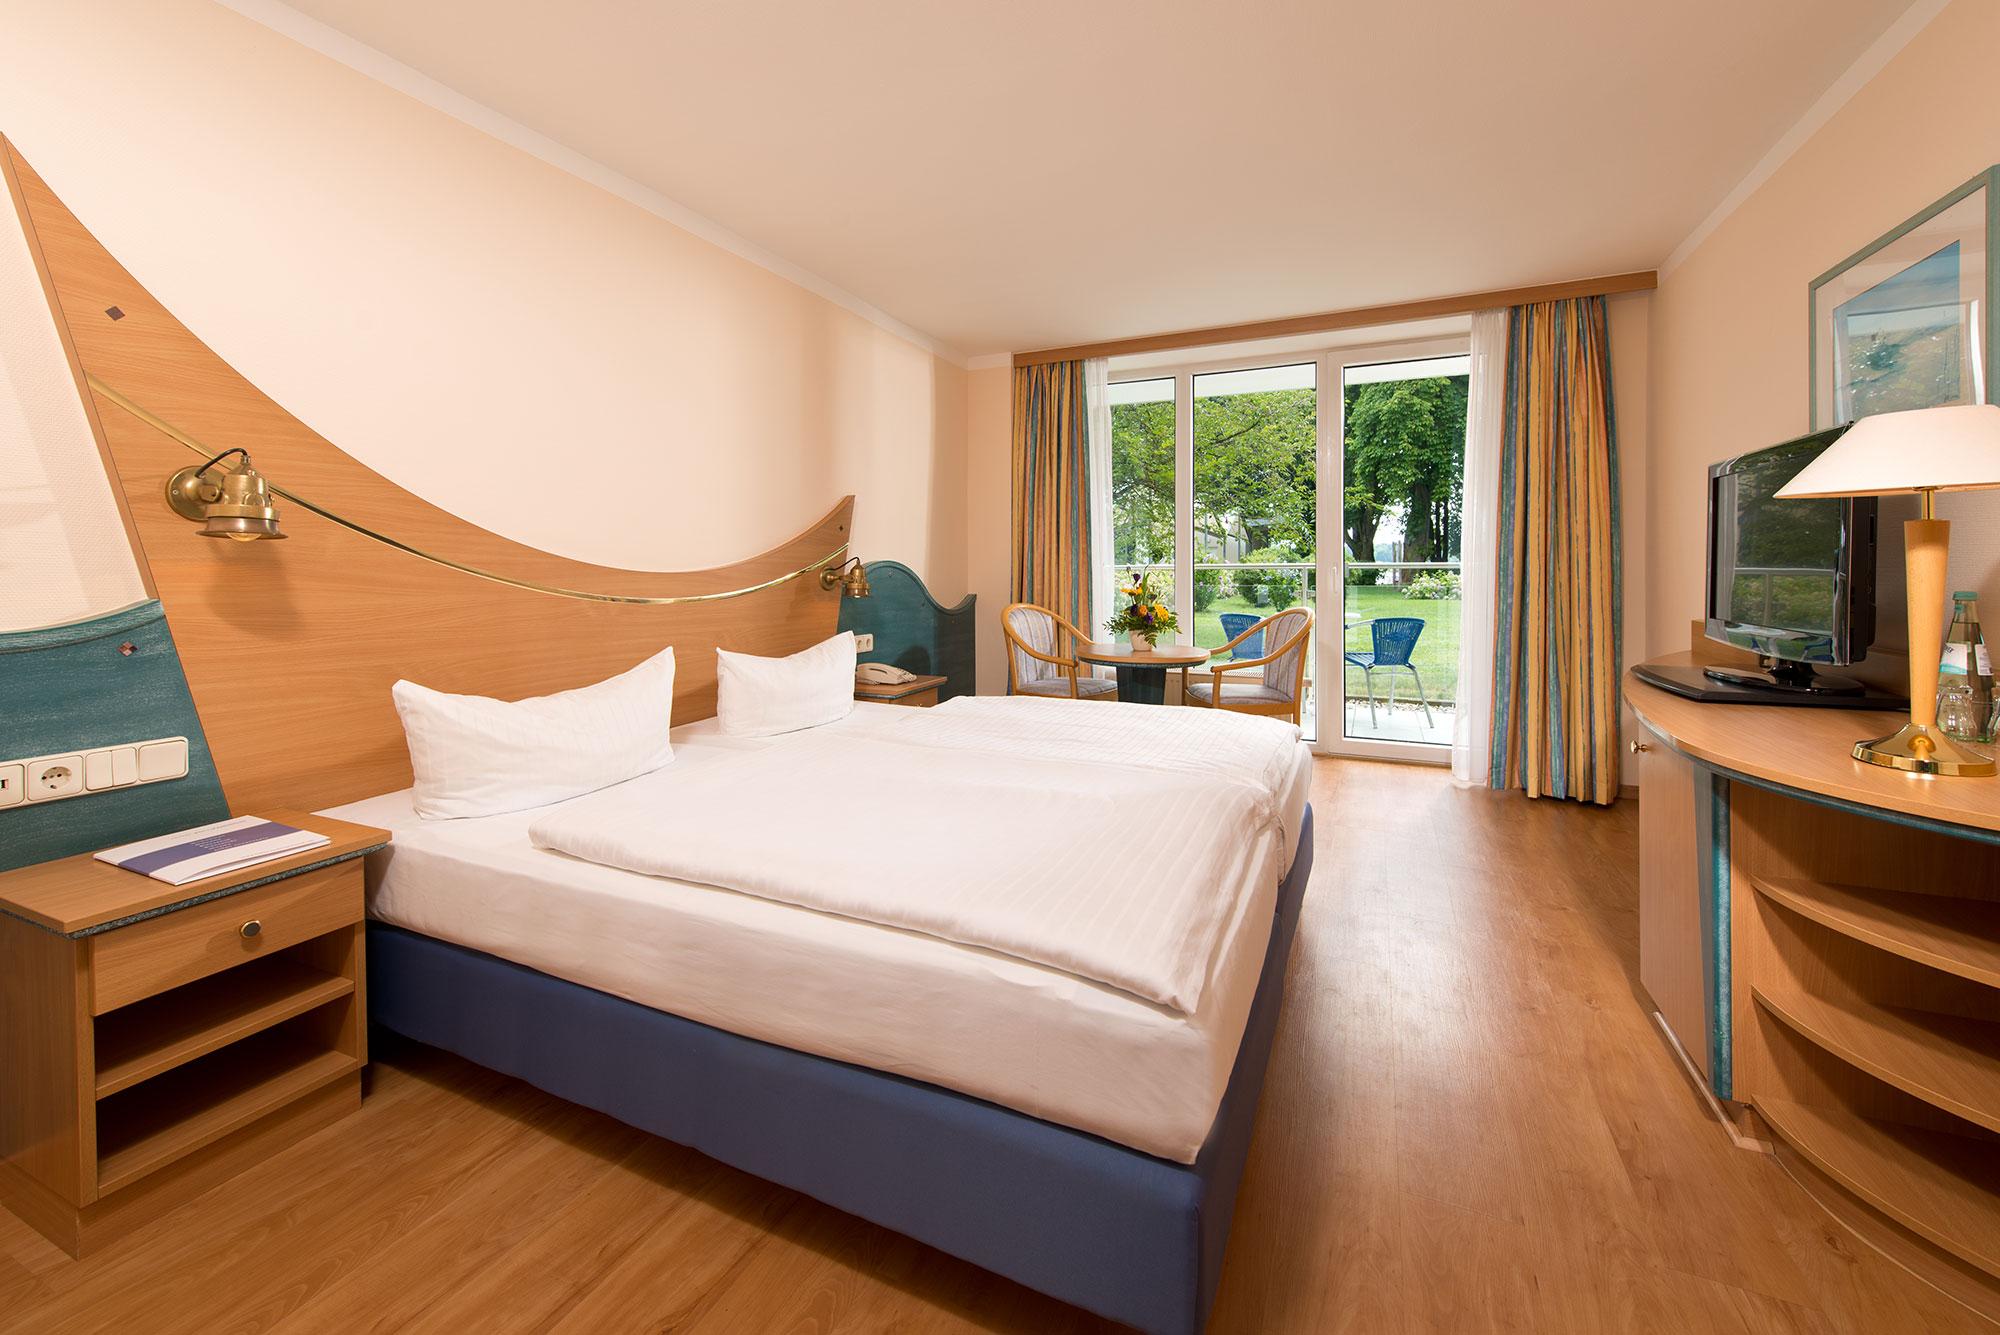 Hotel zimmer hotel bollmannsruh for Zimmer hotel